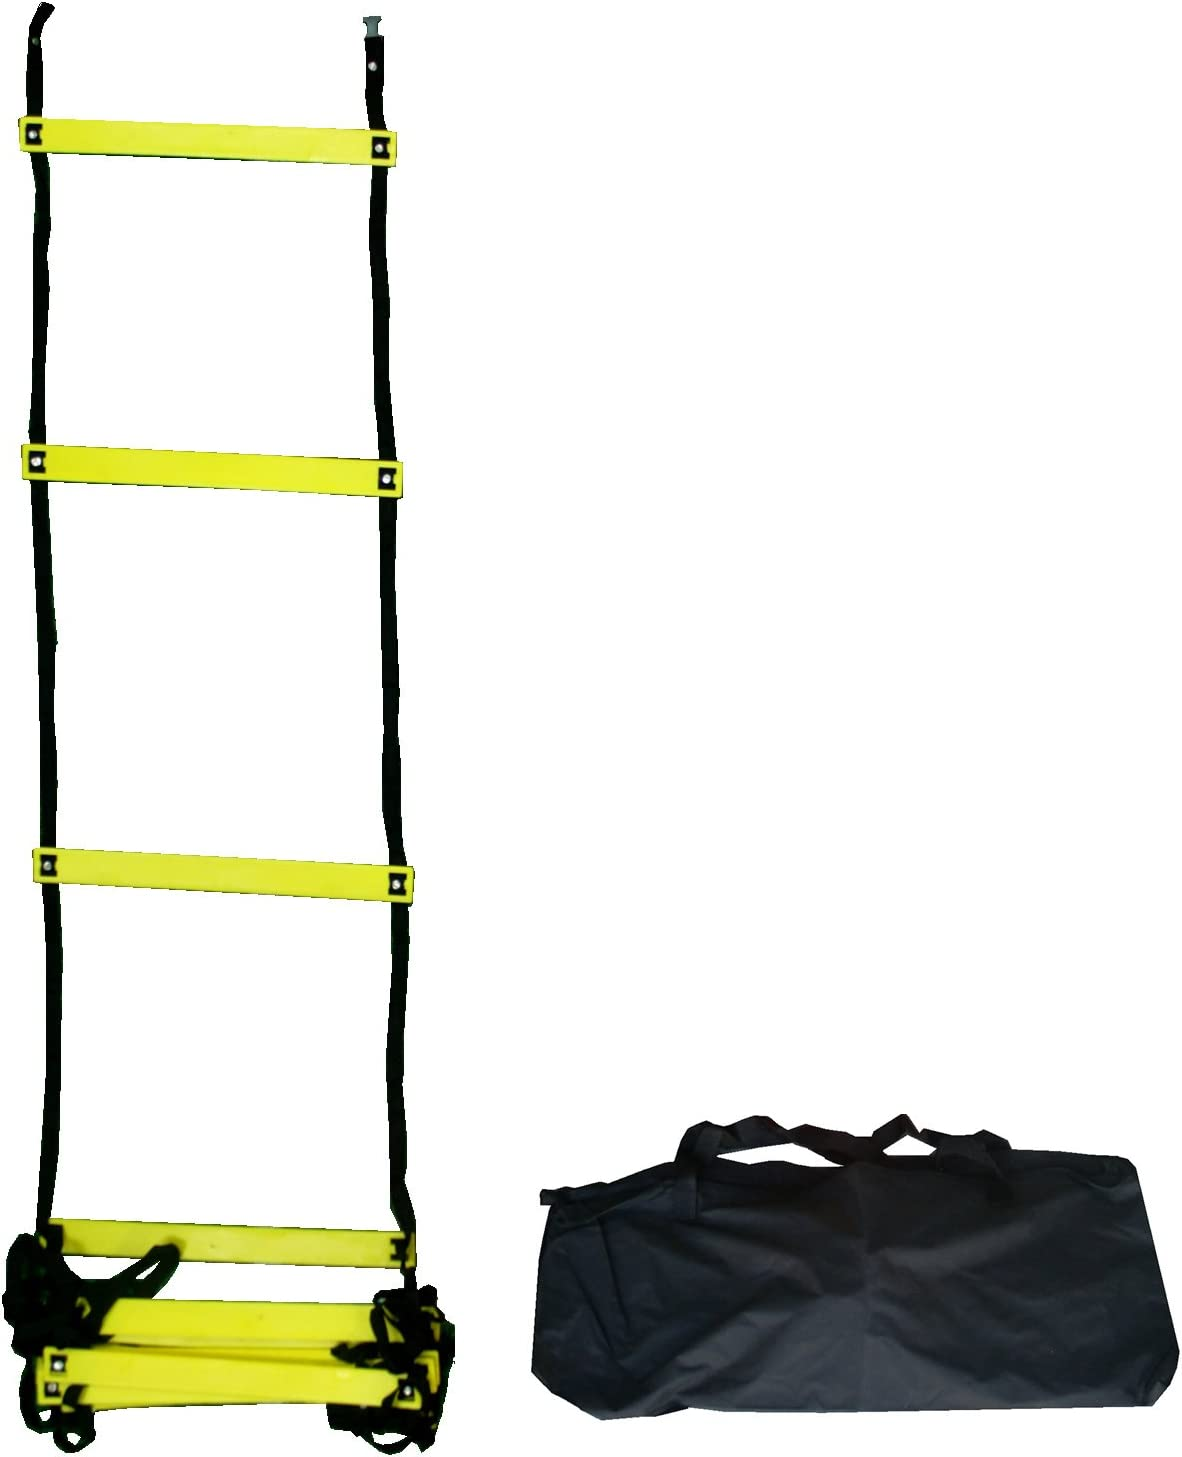 Speed Agility Training Sports Equipment Ladder 15 Feet